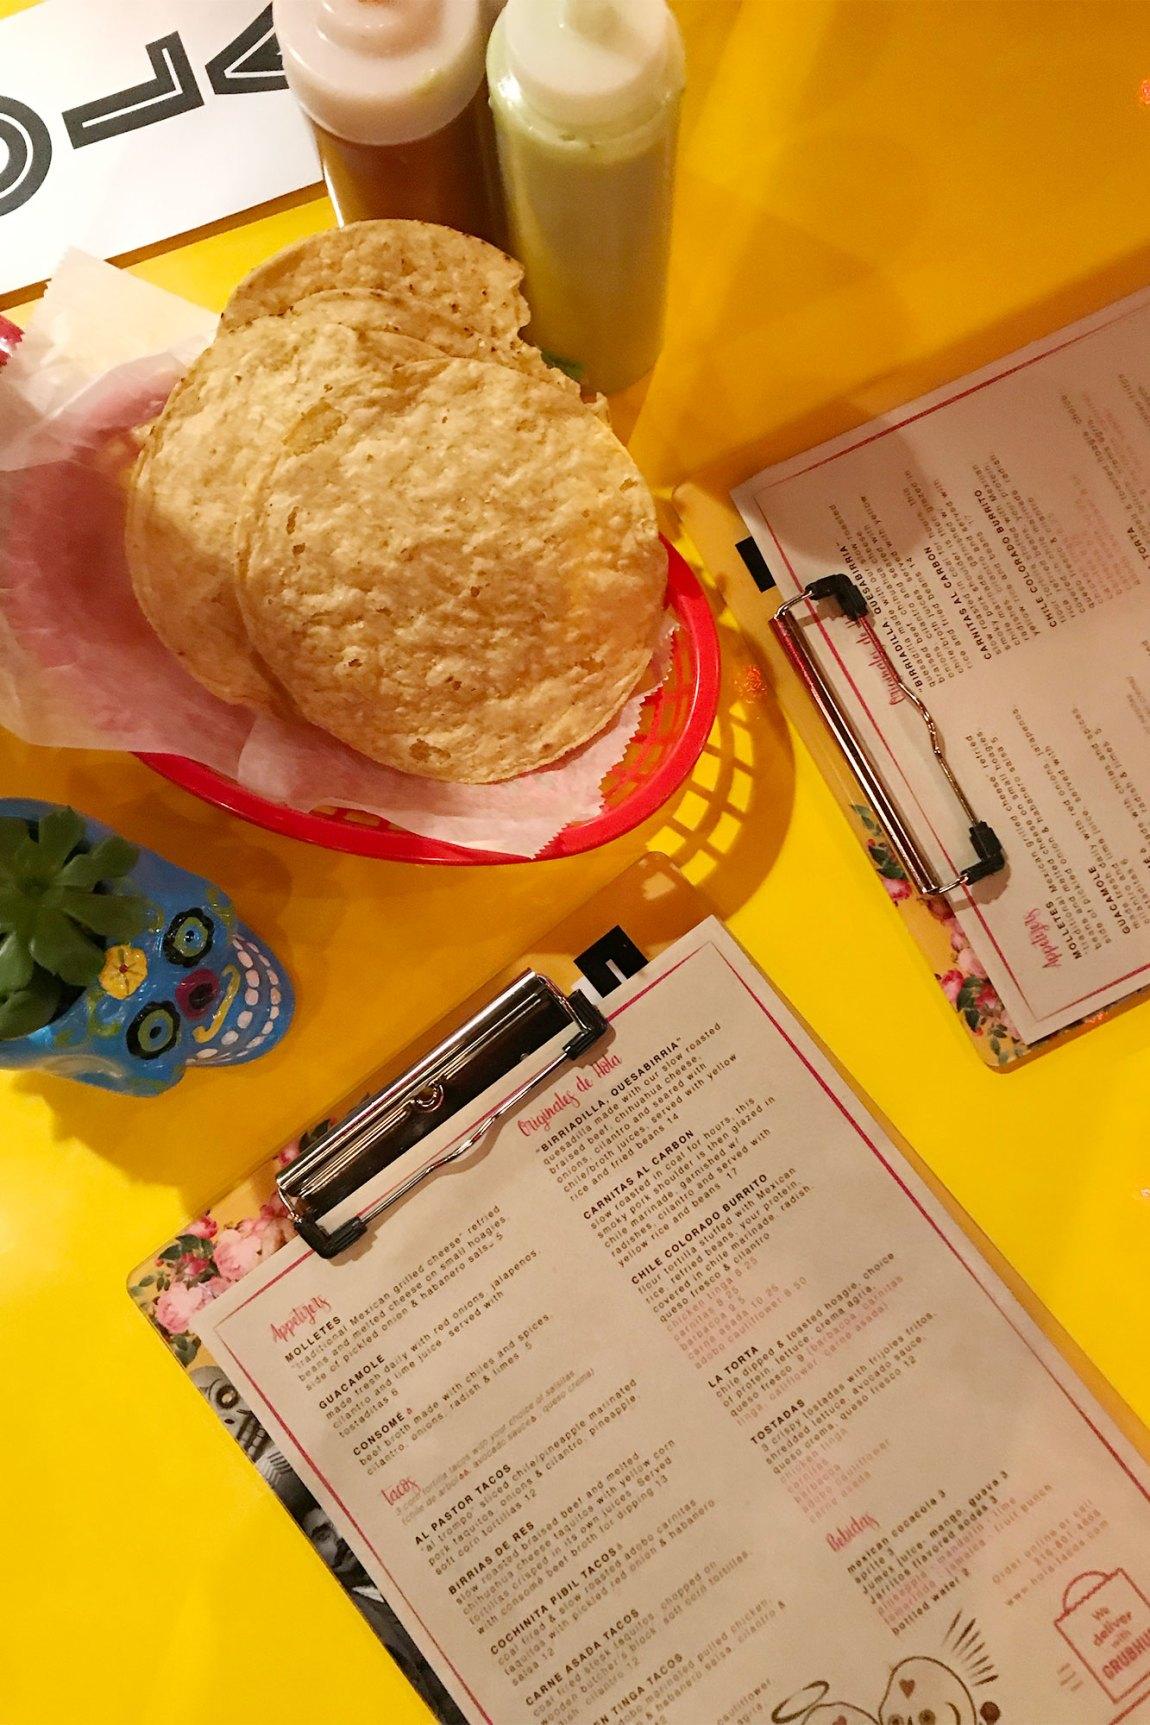 Menus on bright yellow table